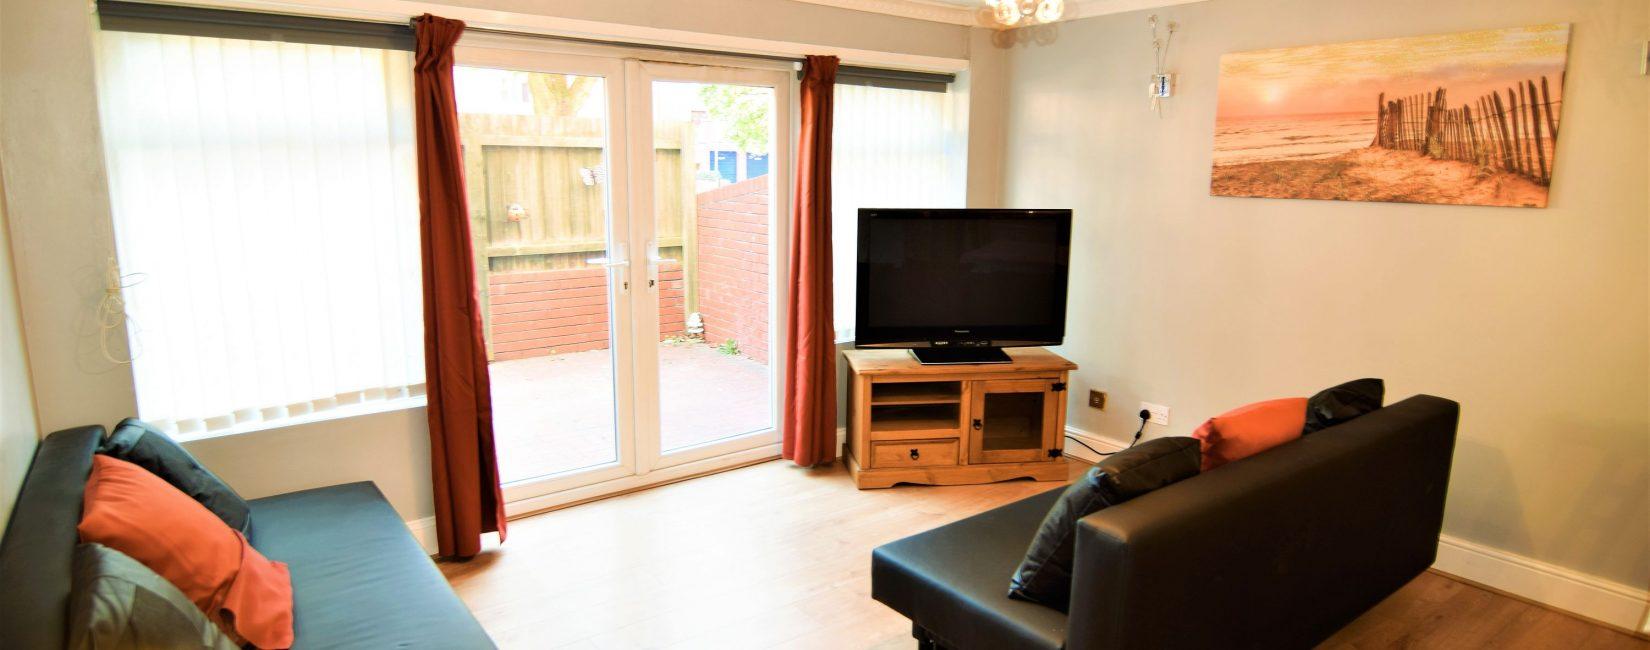 Living room - Quadruple bedroom